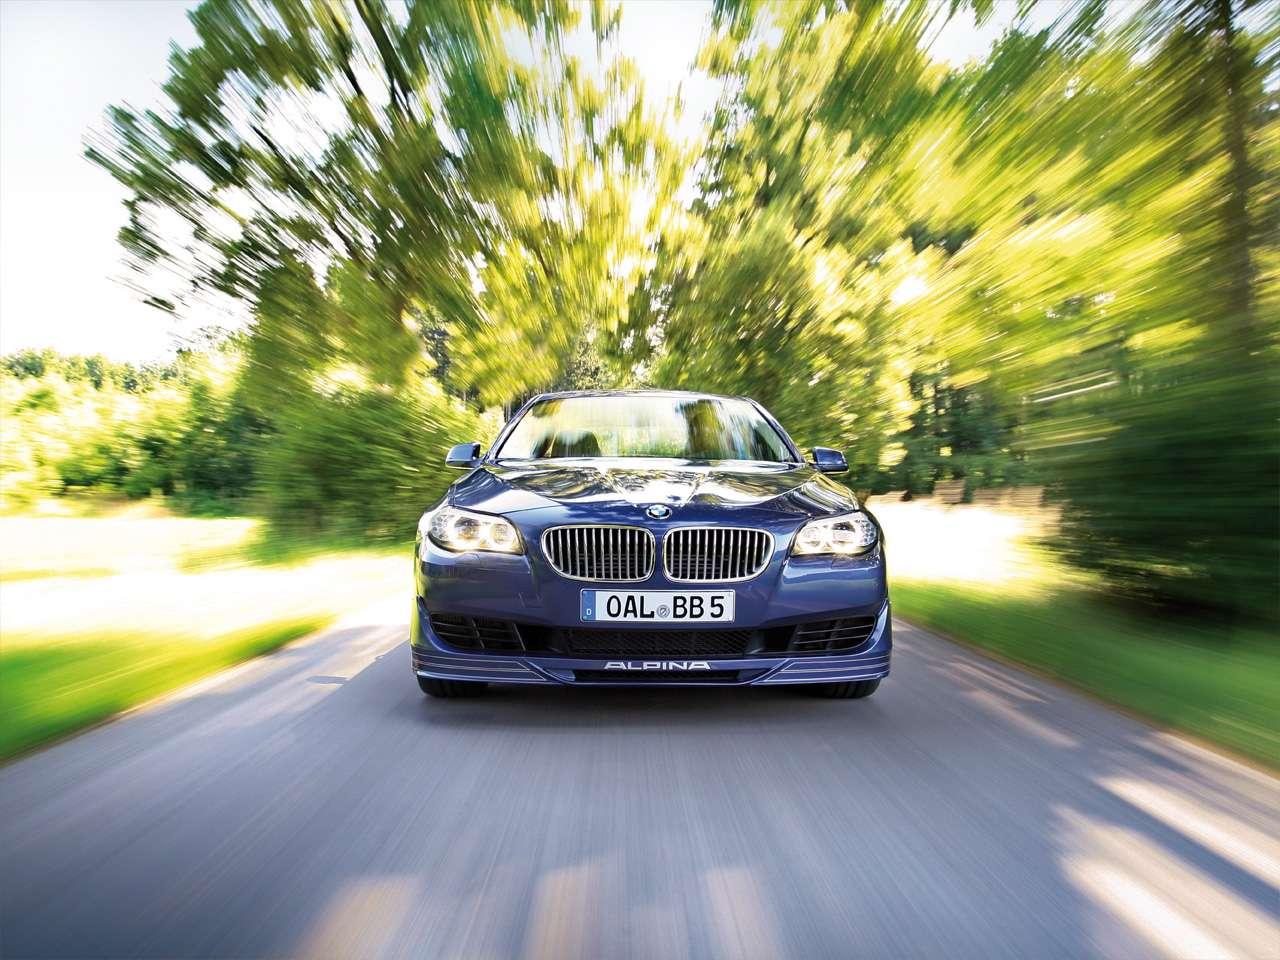 BMW B5 Bi-turbo sierpien 2010